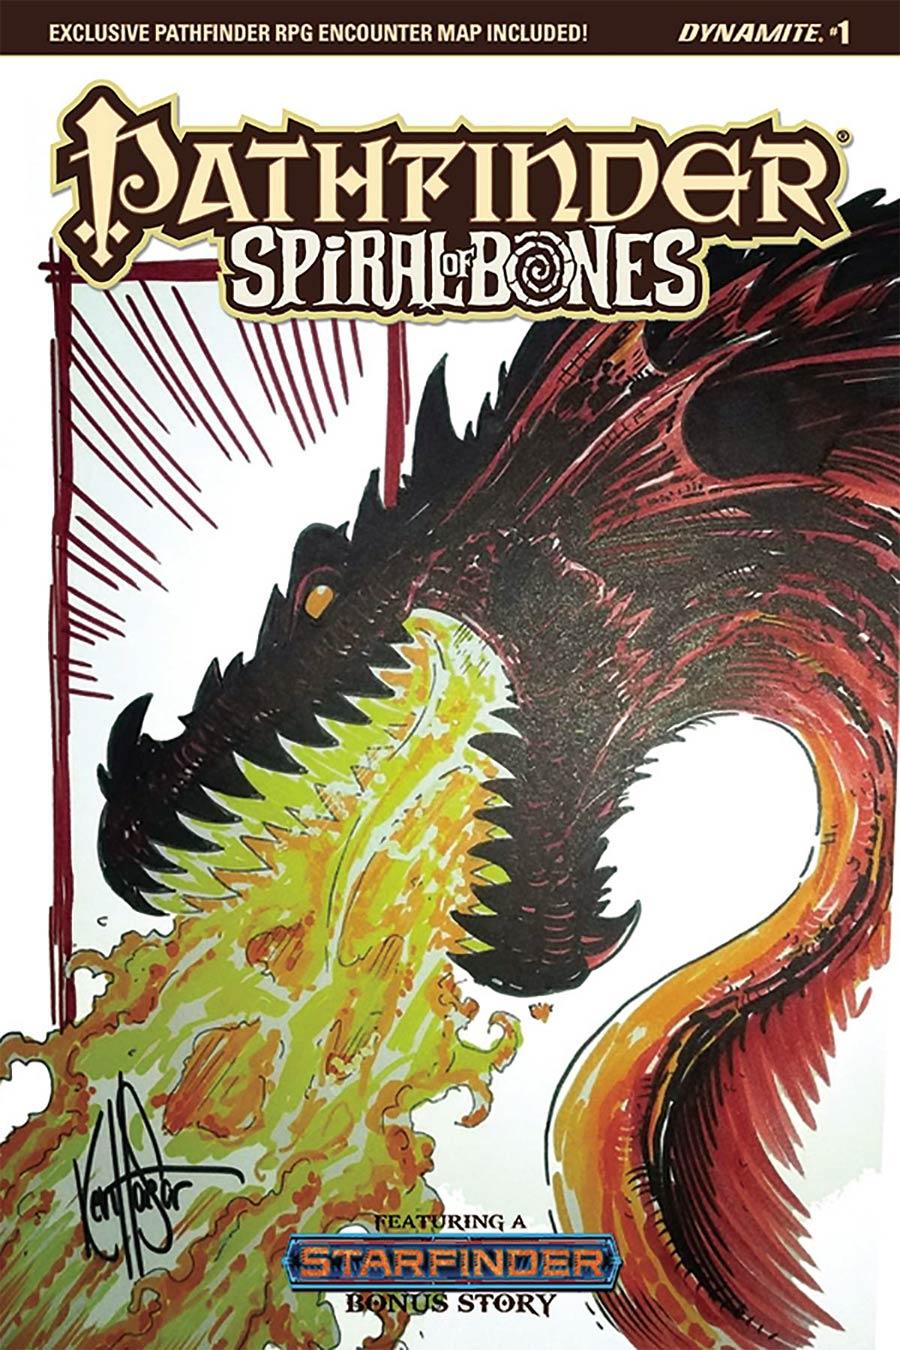 Pathfinder Spiral Of Bones #1 Cover H Ken Haeser Original Hand-Drawn Sketch Cover